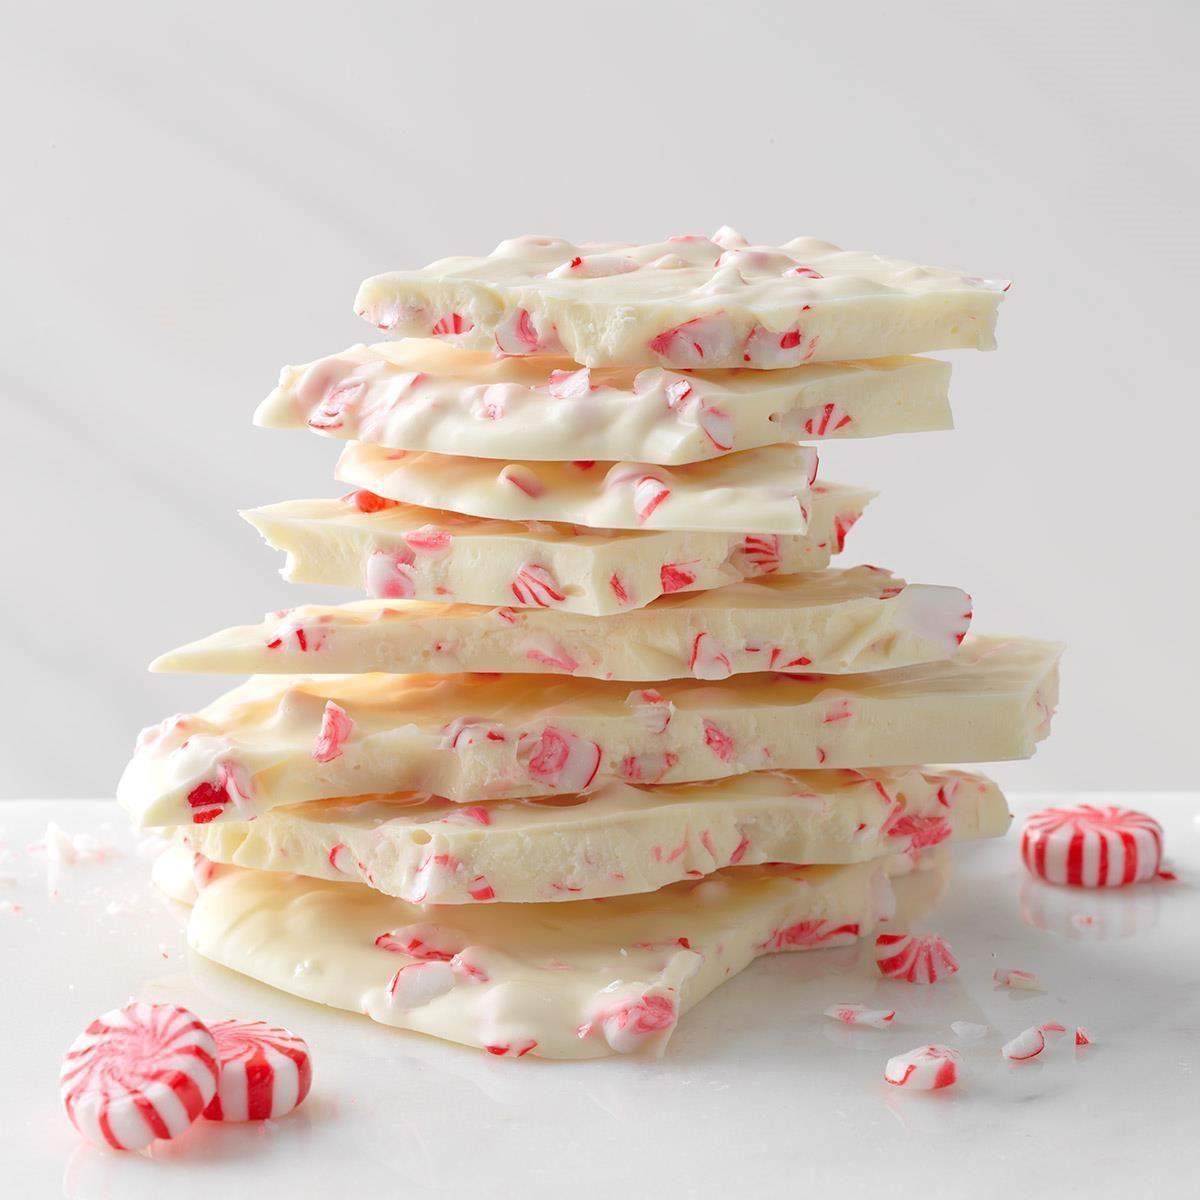 Chocolate Nonpareils White Dunmore Candy Kitchen: White Chocolate Peppermint Crunch Recipe